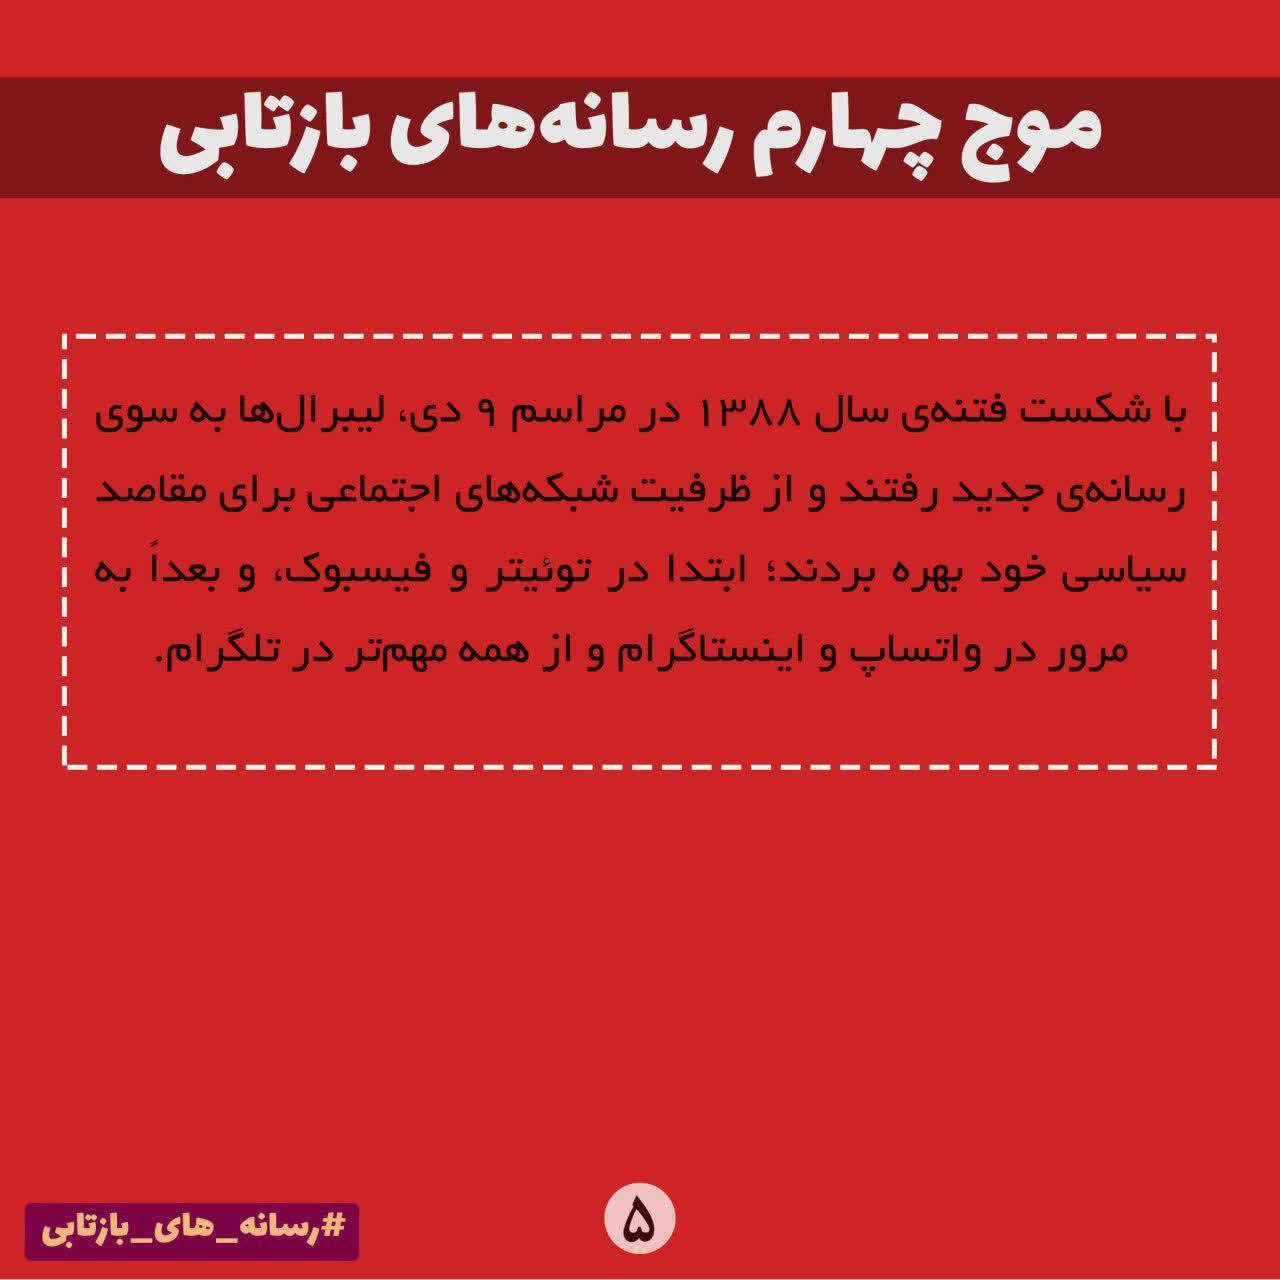 http://dl-abbasi.ir/yekta/1398/Graphic/RMT/2/5.jpg